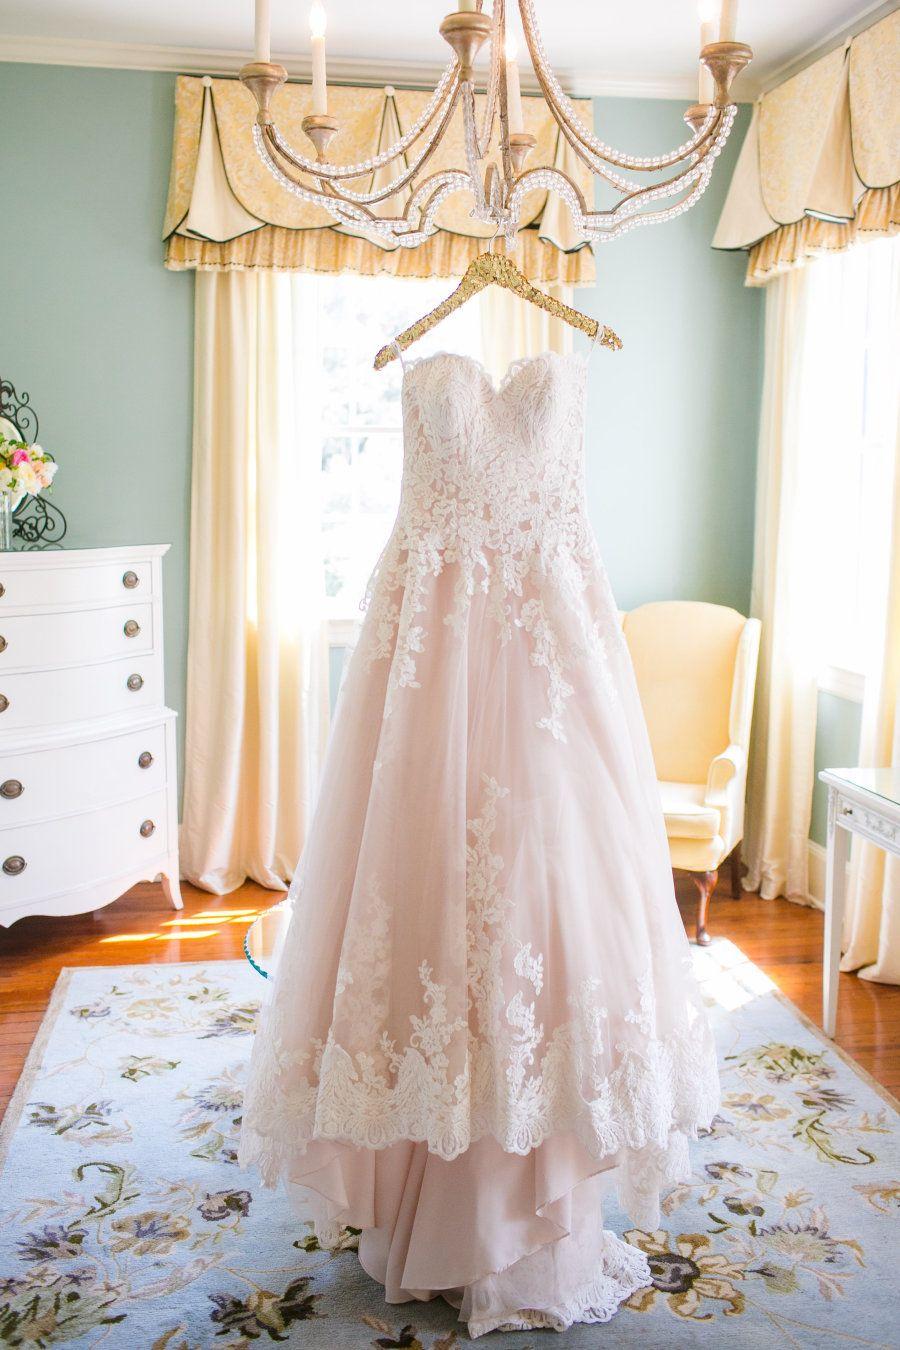 Cream colored vintage wedding dresses  Vintage Chic Legare Waring House Wedding in Charleston SC  Lake